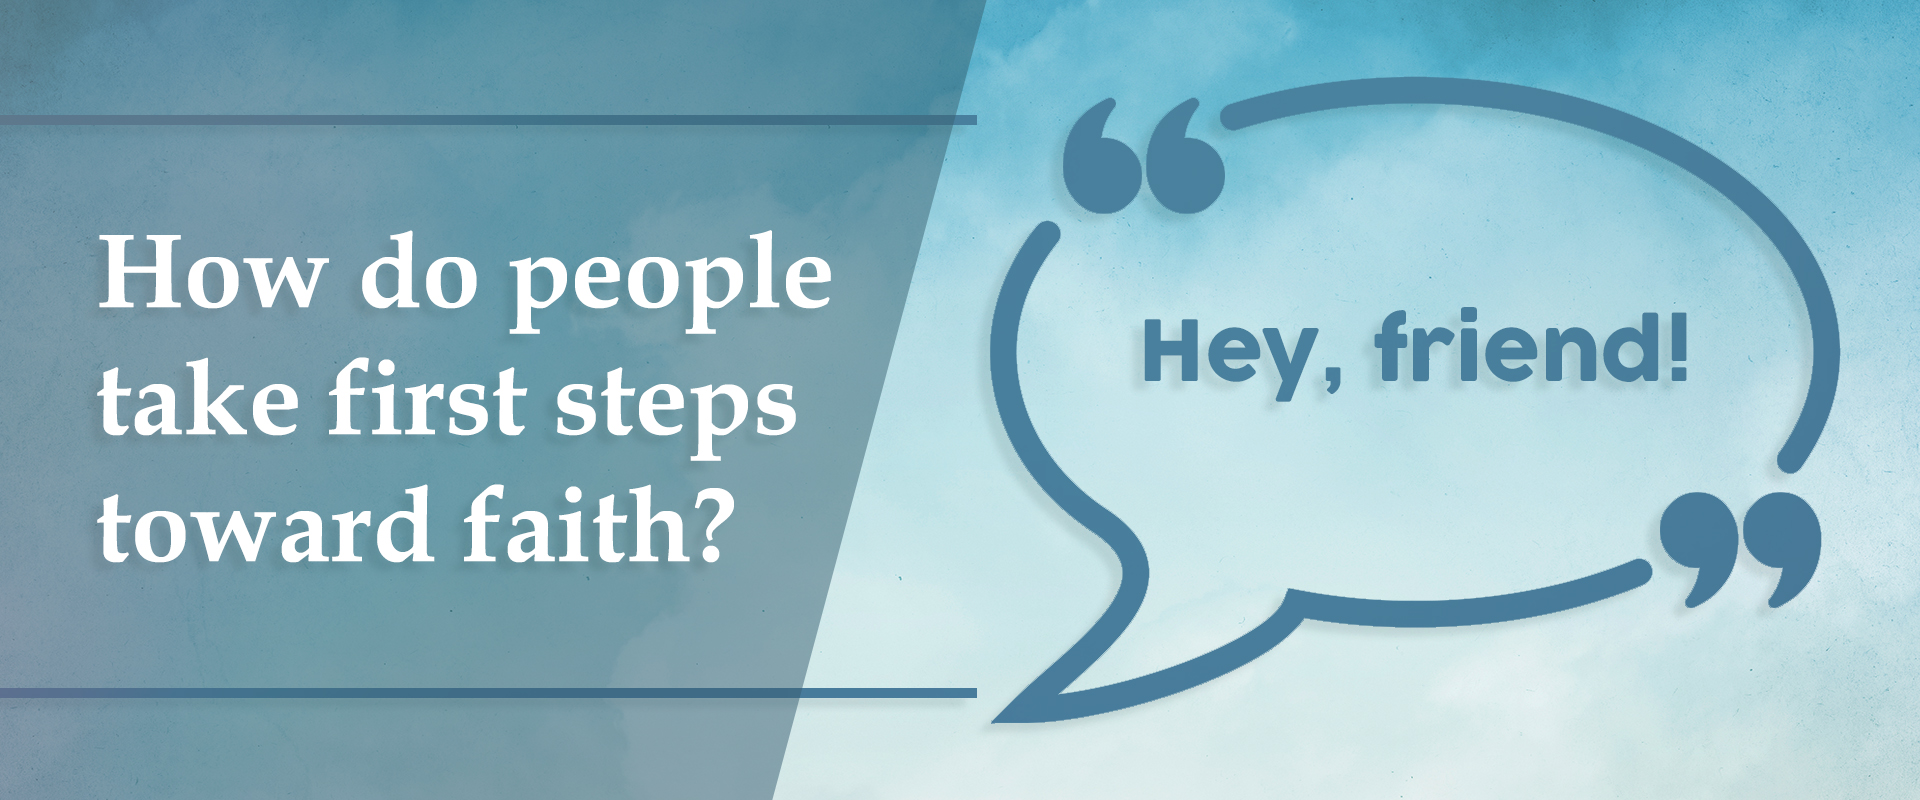 how do people take steps